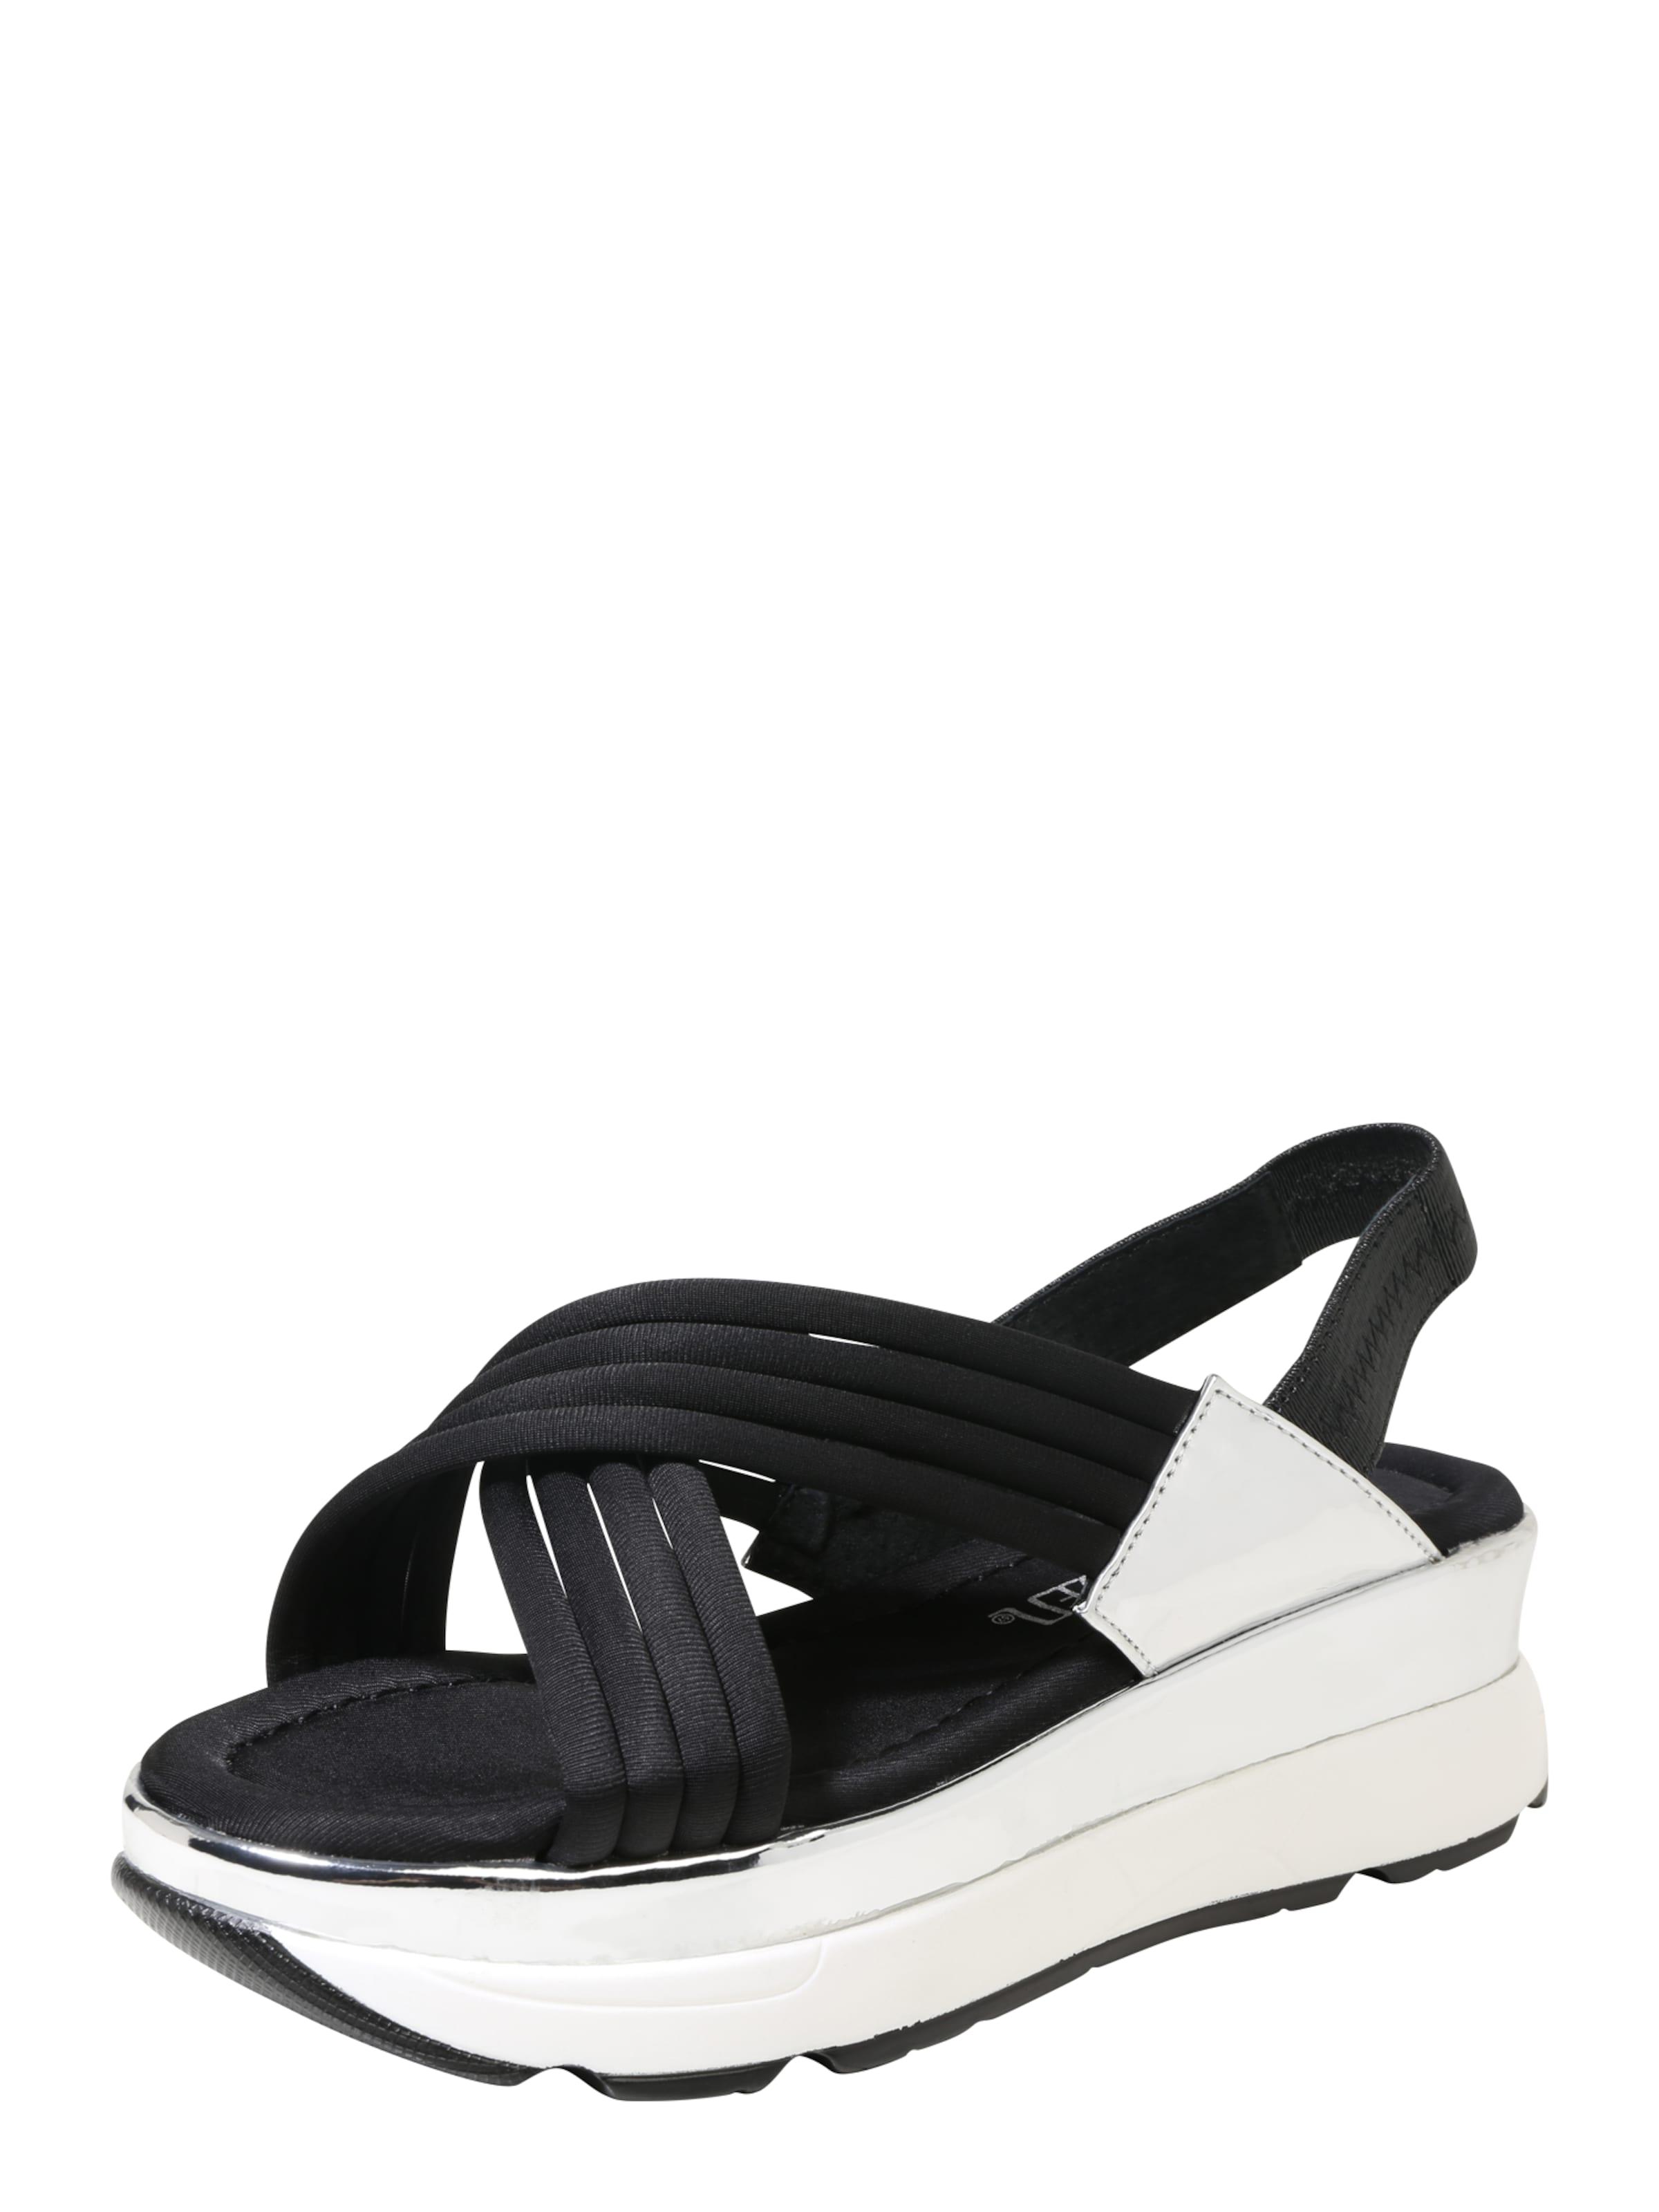 Sixtyseven Sandalette mit Keilabsatz Drake Hohe Qualität